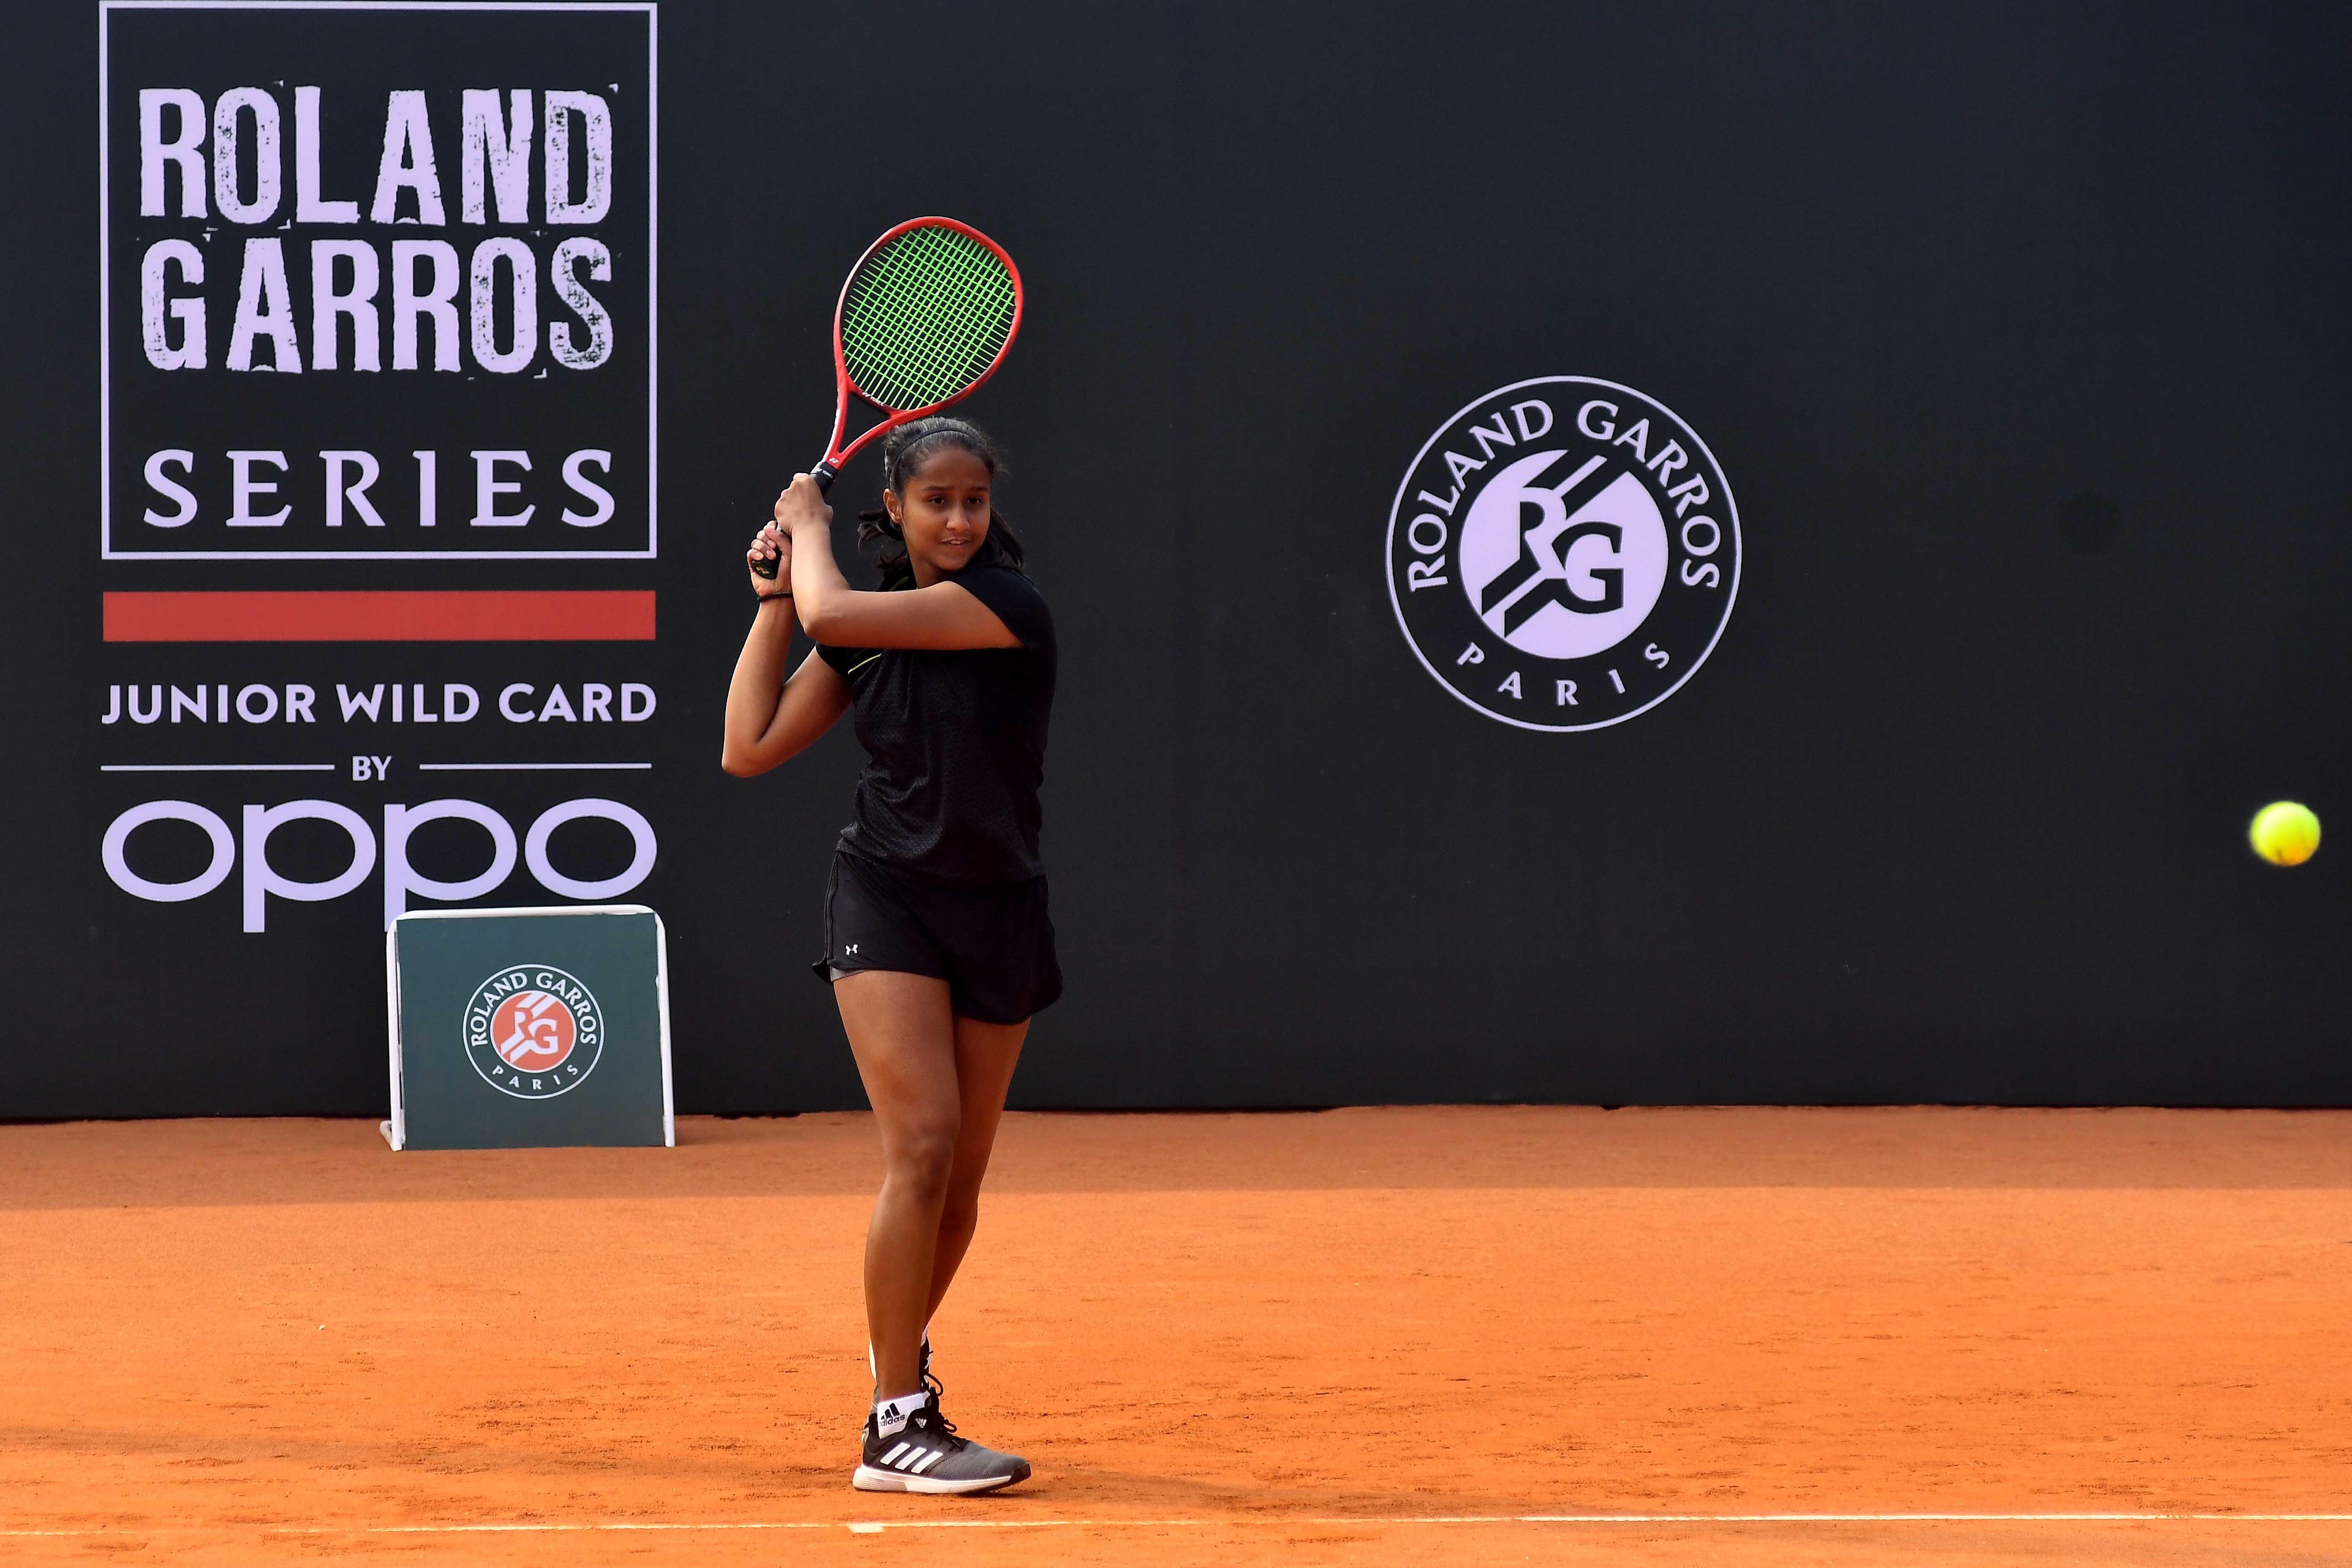 Vaishnavi Adkar Roland-Garros wild card series by OPPO